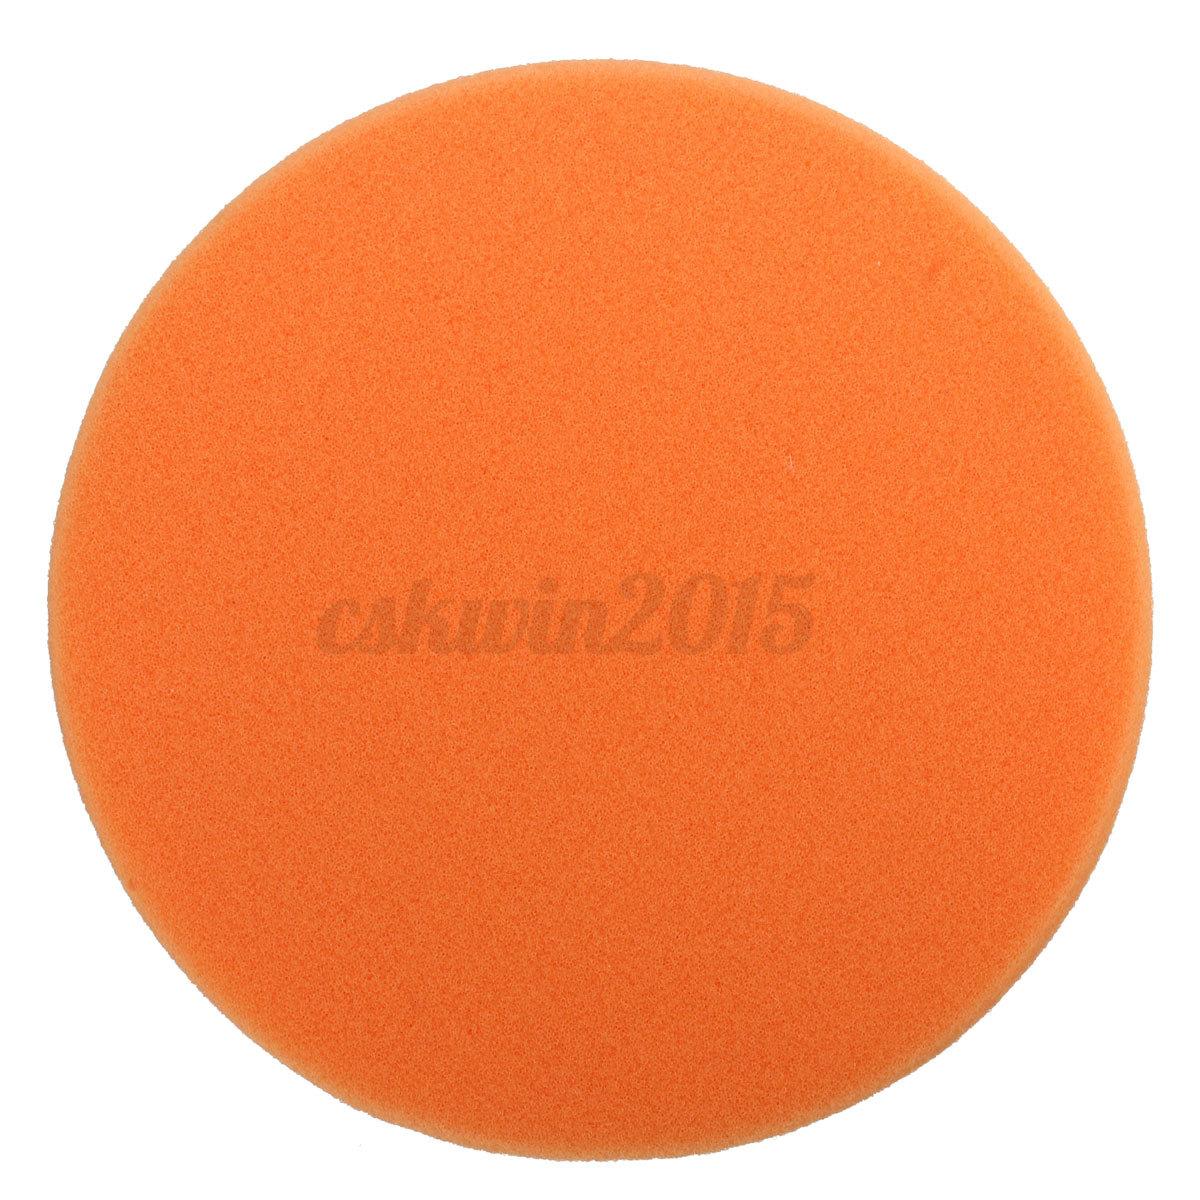 6 Inch 150mm Soft Flat Sponge Buffer Polishing Pad Kit For